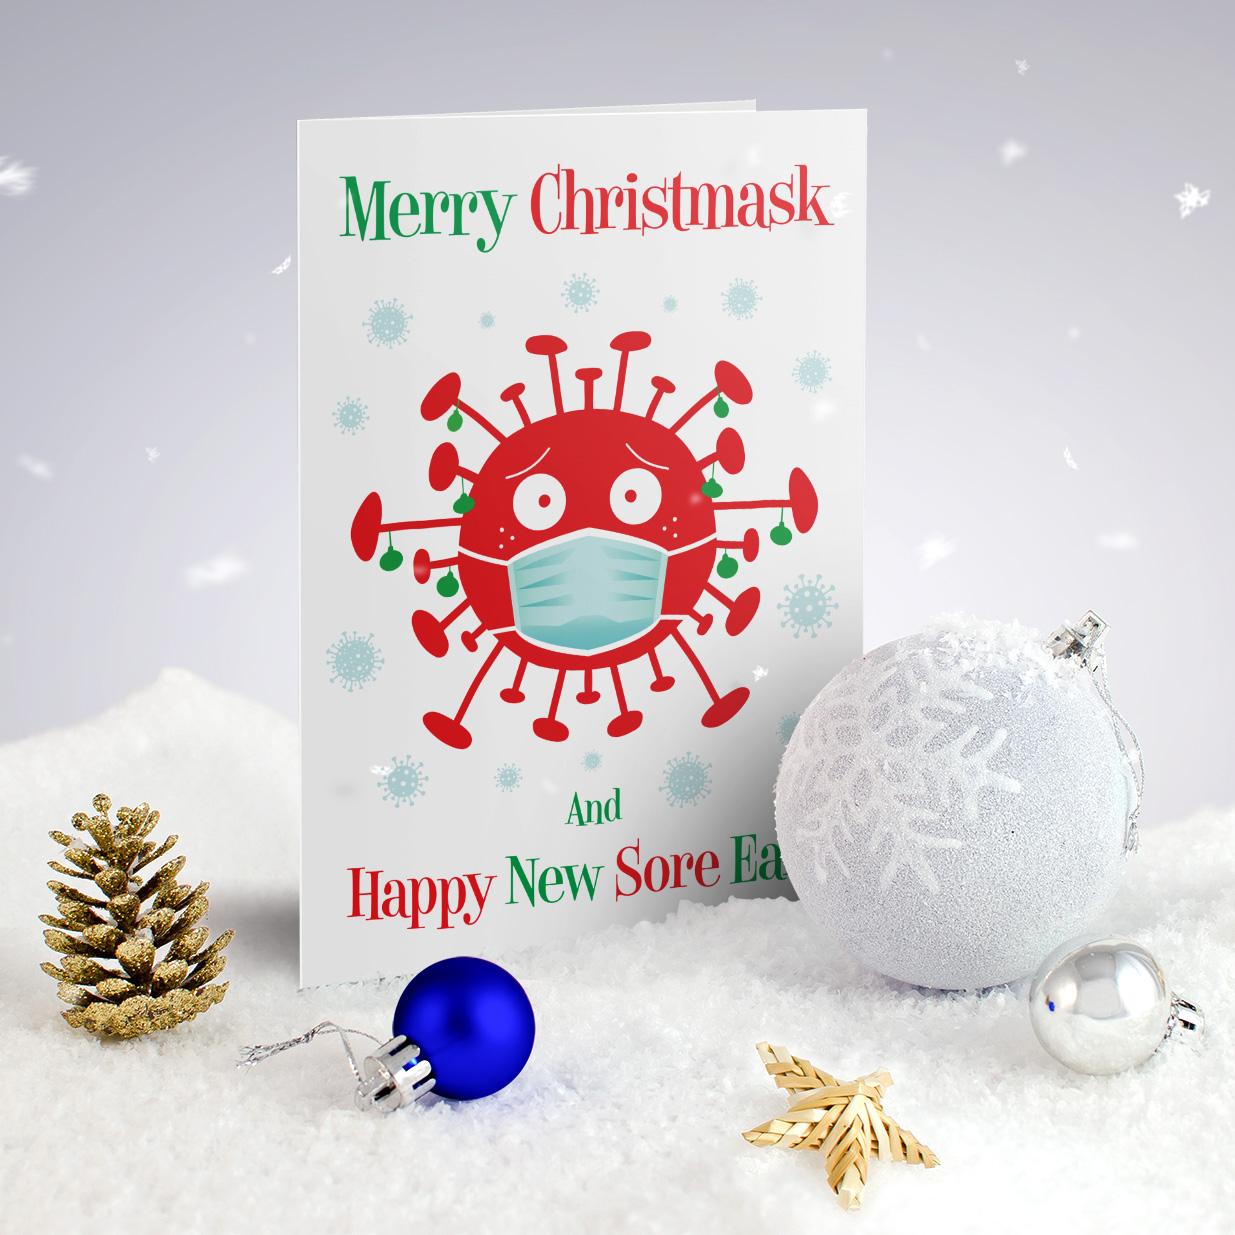 merry christ mask funny coronavirus lockdown christmas cards